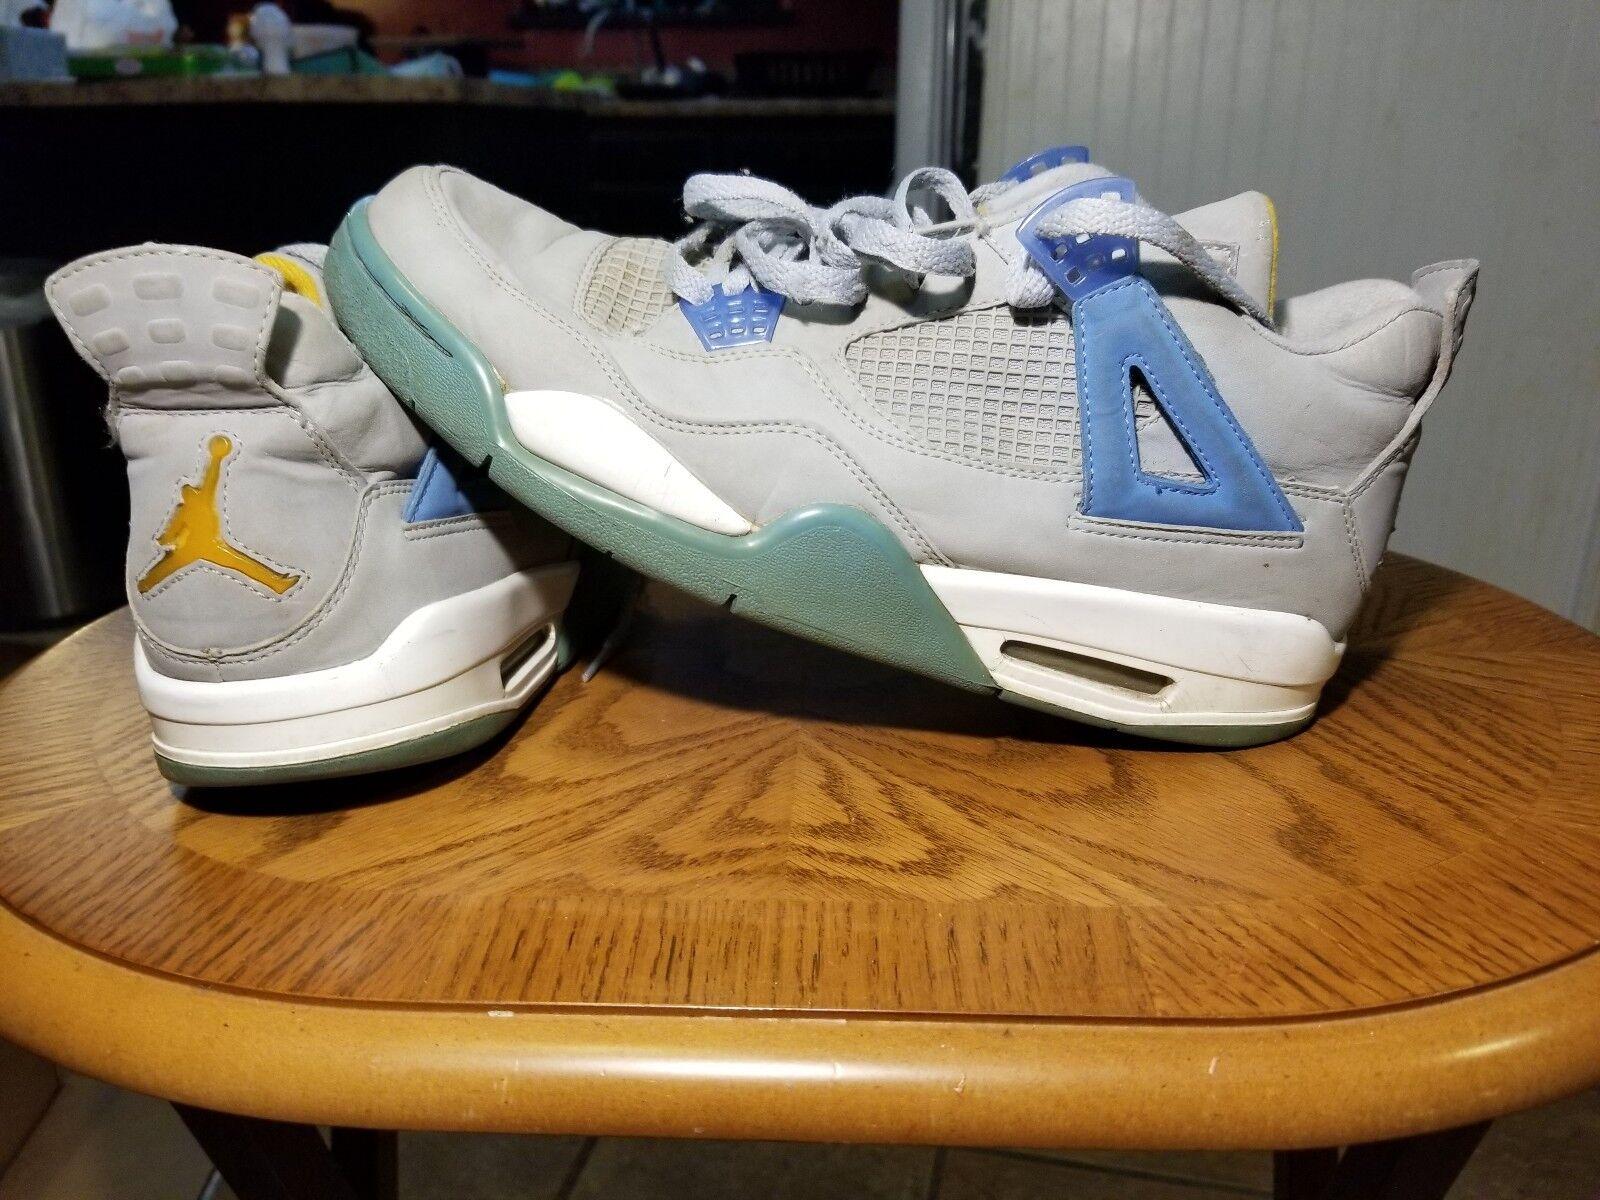 best sneakers 8f402 a9d85 ... low georgetown hoyas mist 11.5 12bf7 c0b15  free shipping nike iv air  jordan iv nike 4 rétro gris jaune mist bleu taille 11